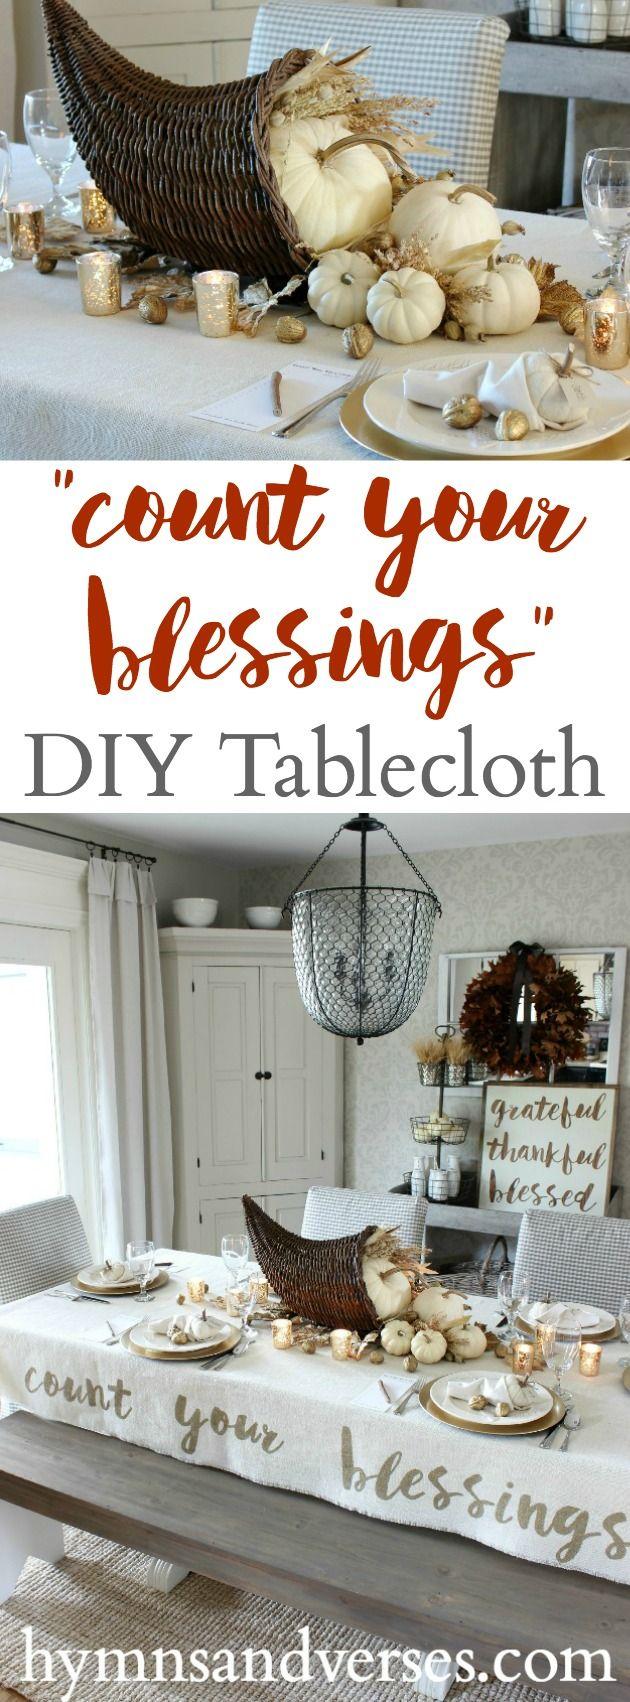 Best 25+ Tablecloth diy ideas on Pinterest | Paper tablecloth ...